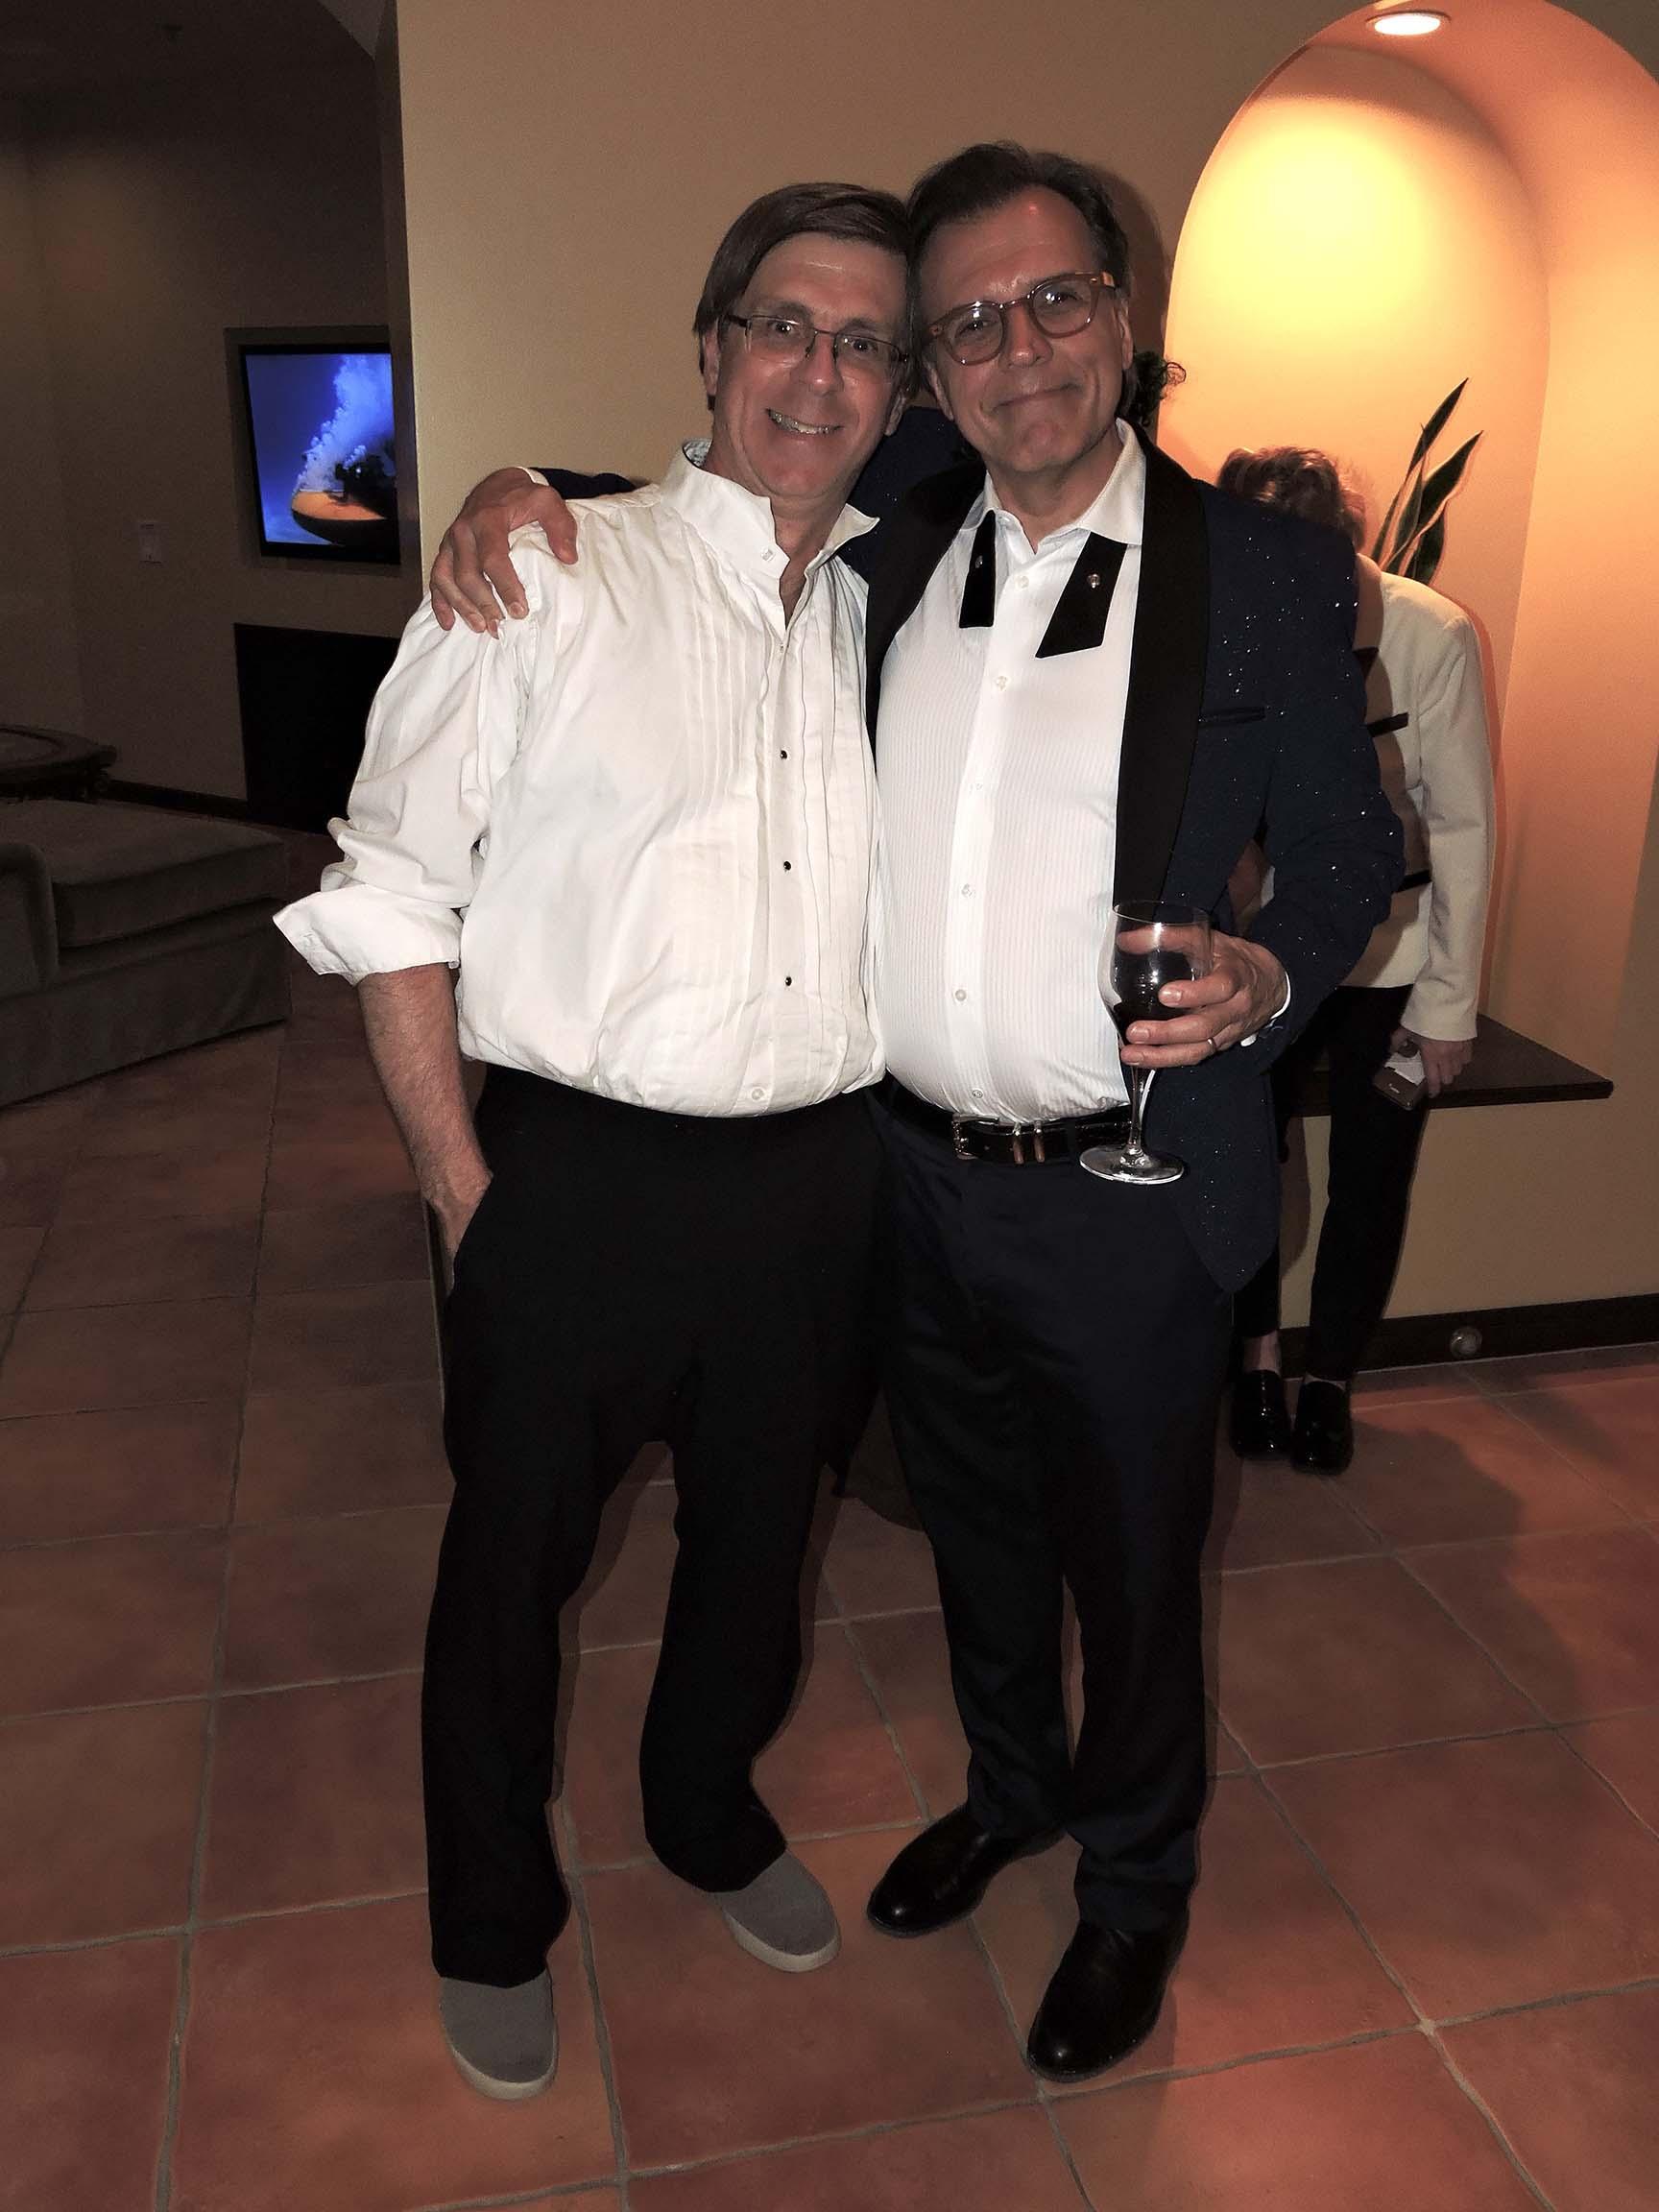 Bill Janocha (left) and Wayno